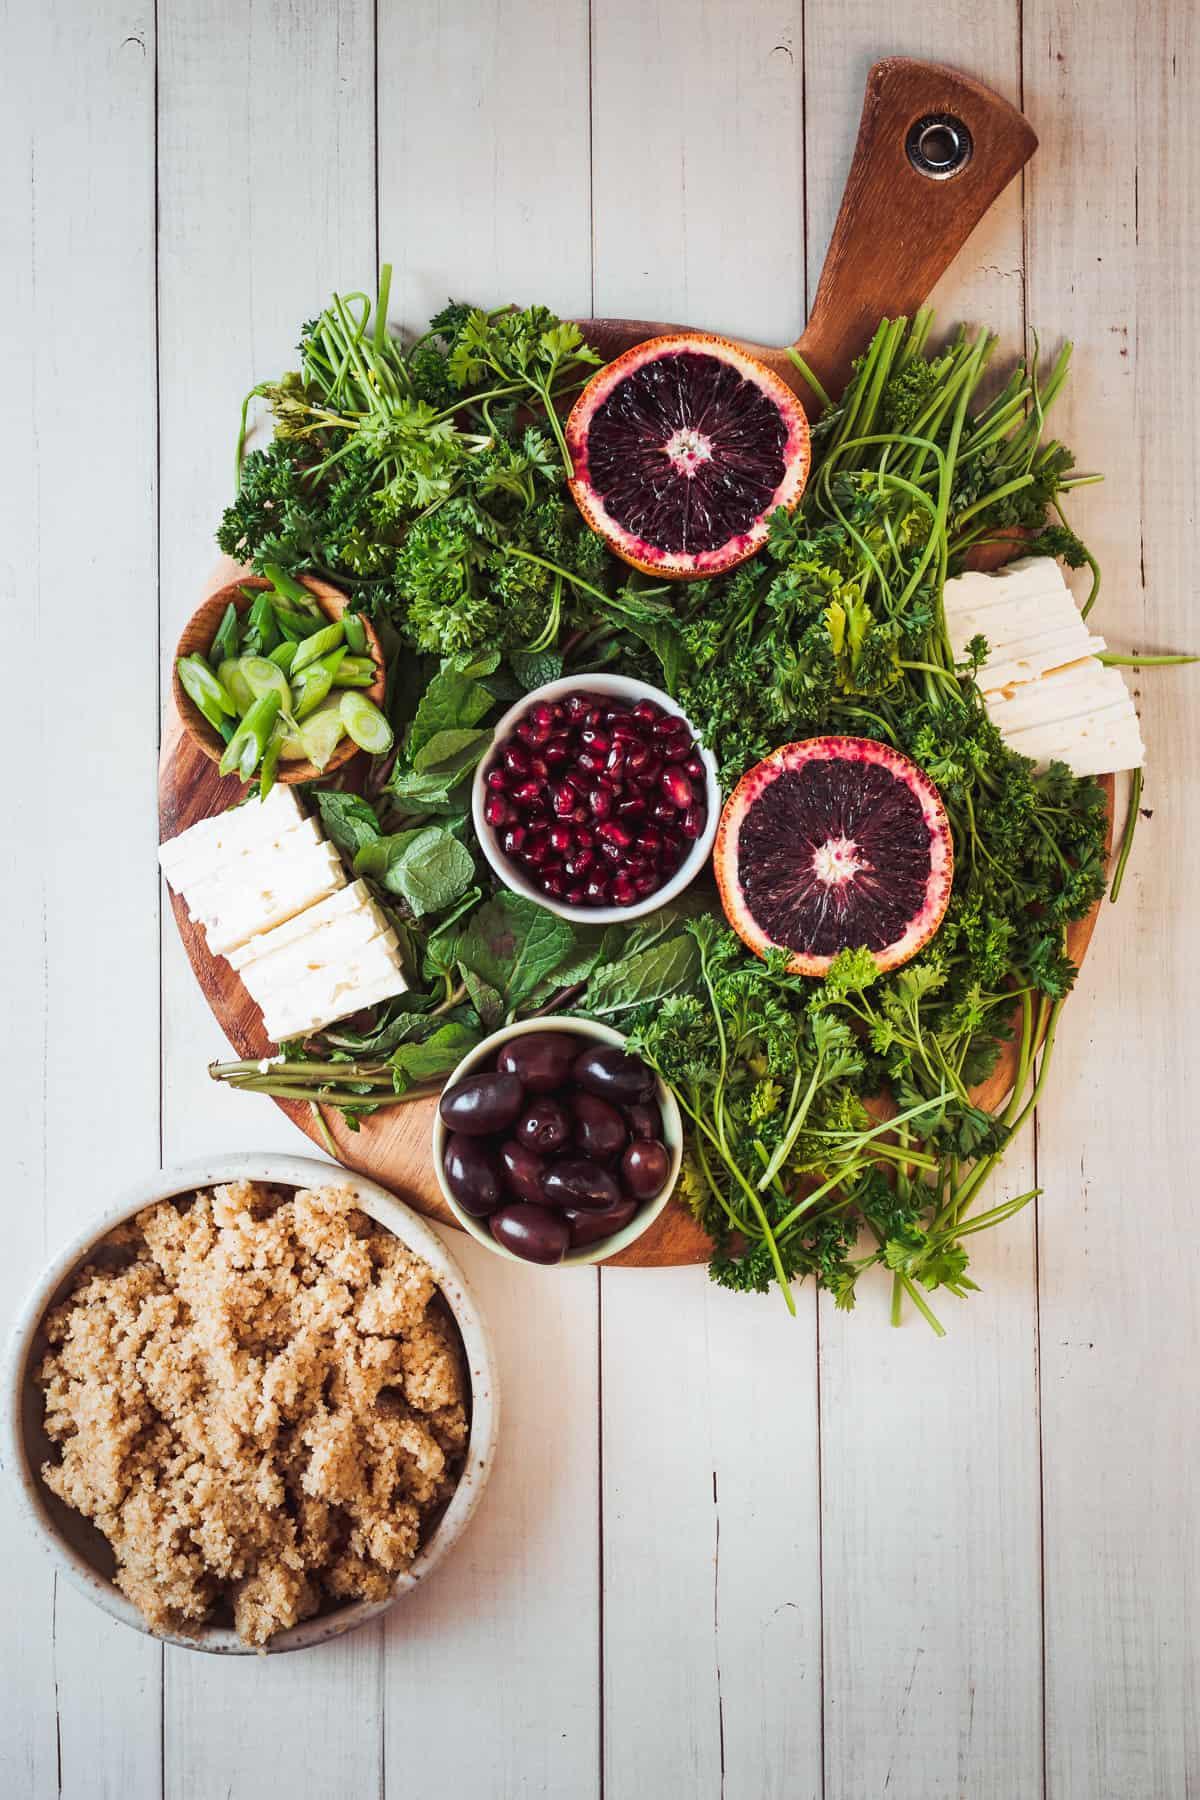 bulgur salad ingredients